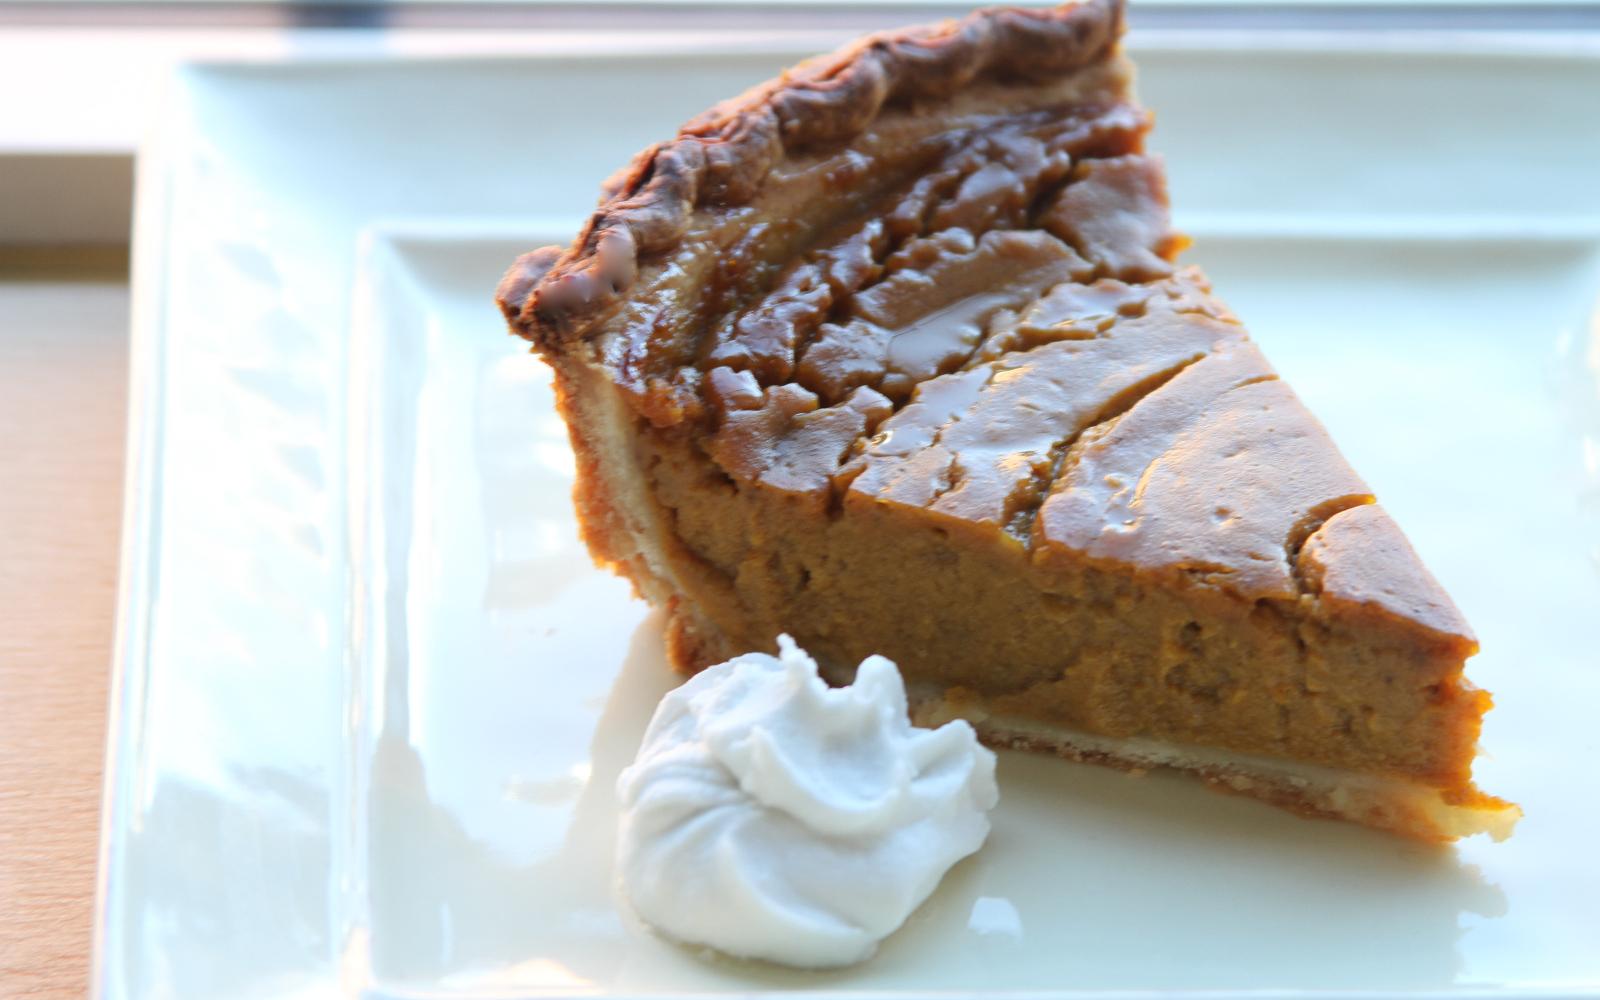 Pumpkin Pie With Coconut Rum Whipped Cream [Vegan]